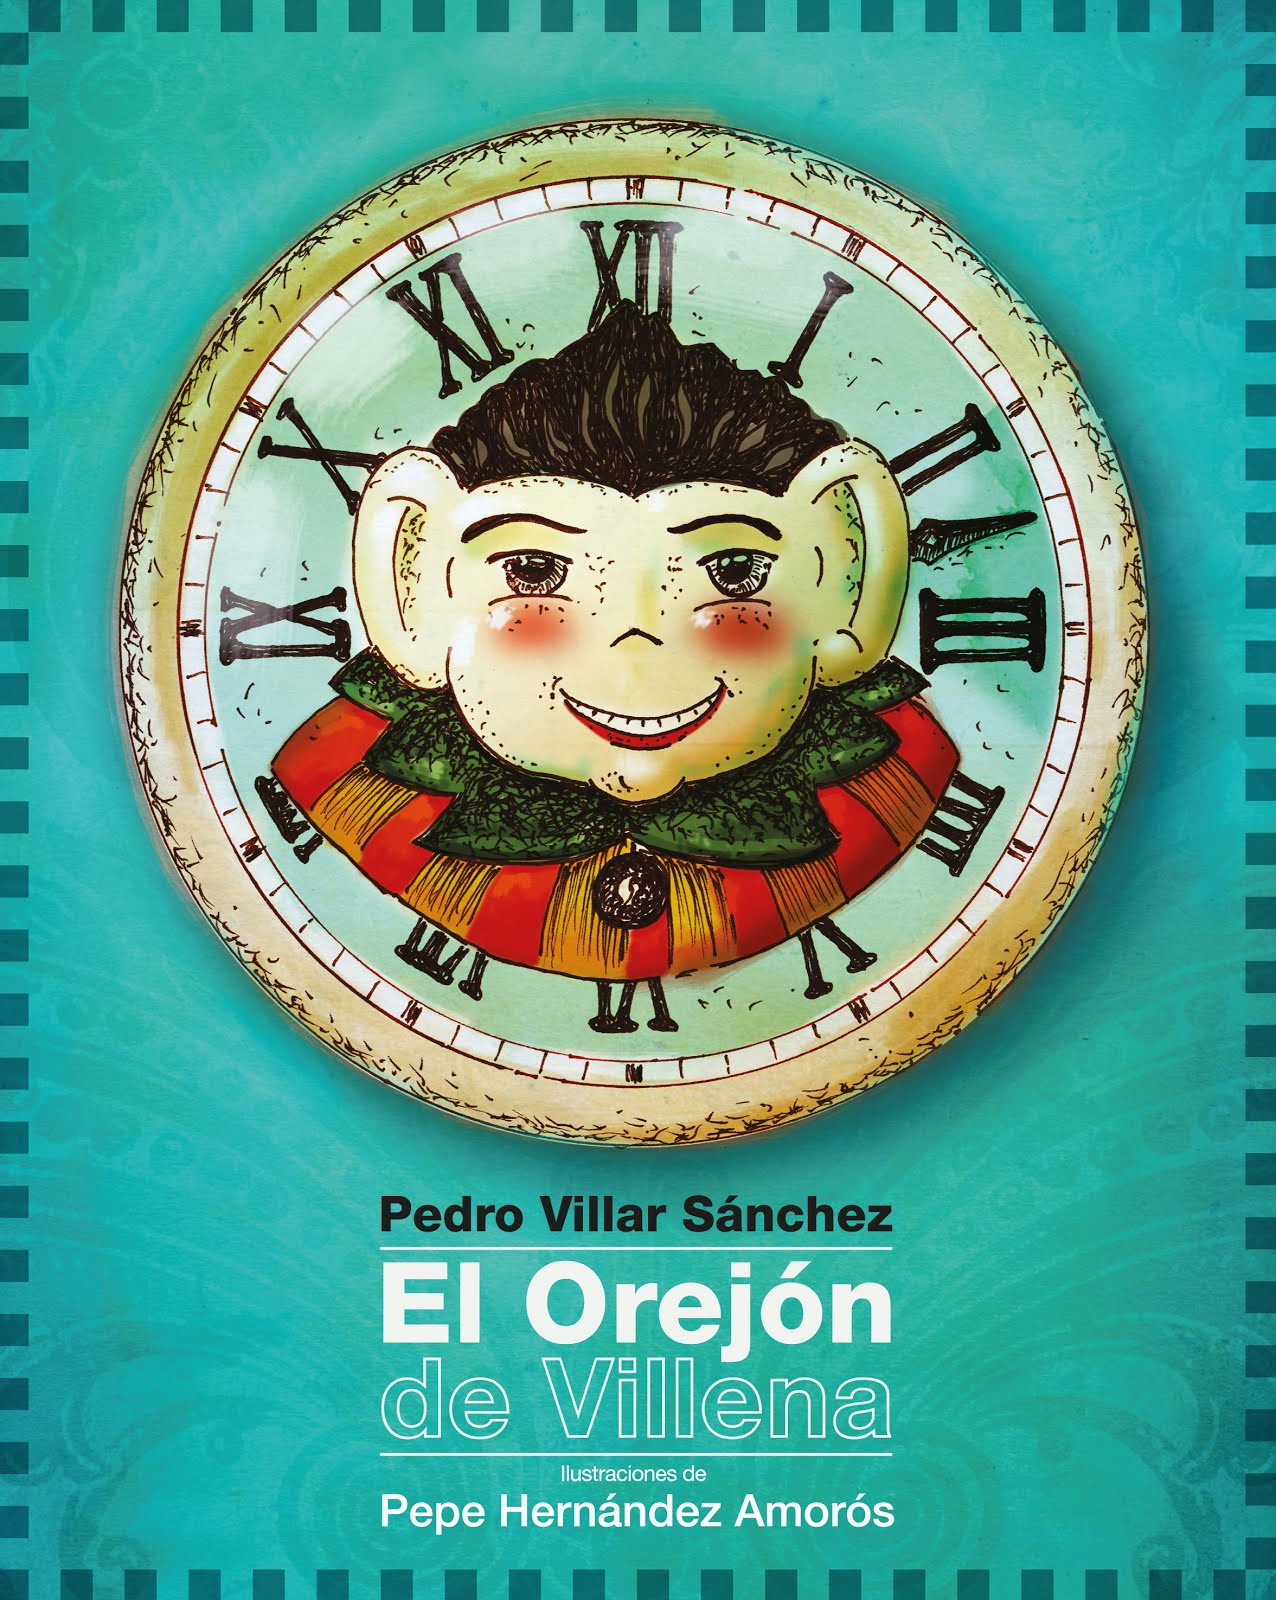 EL OREJÓN DE VILLENA